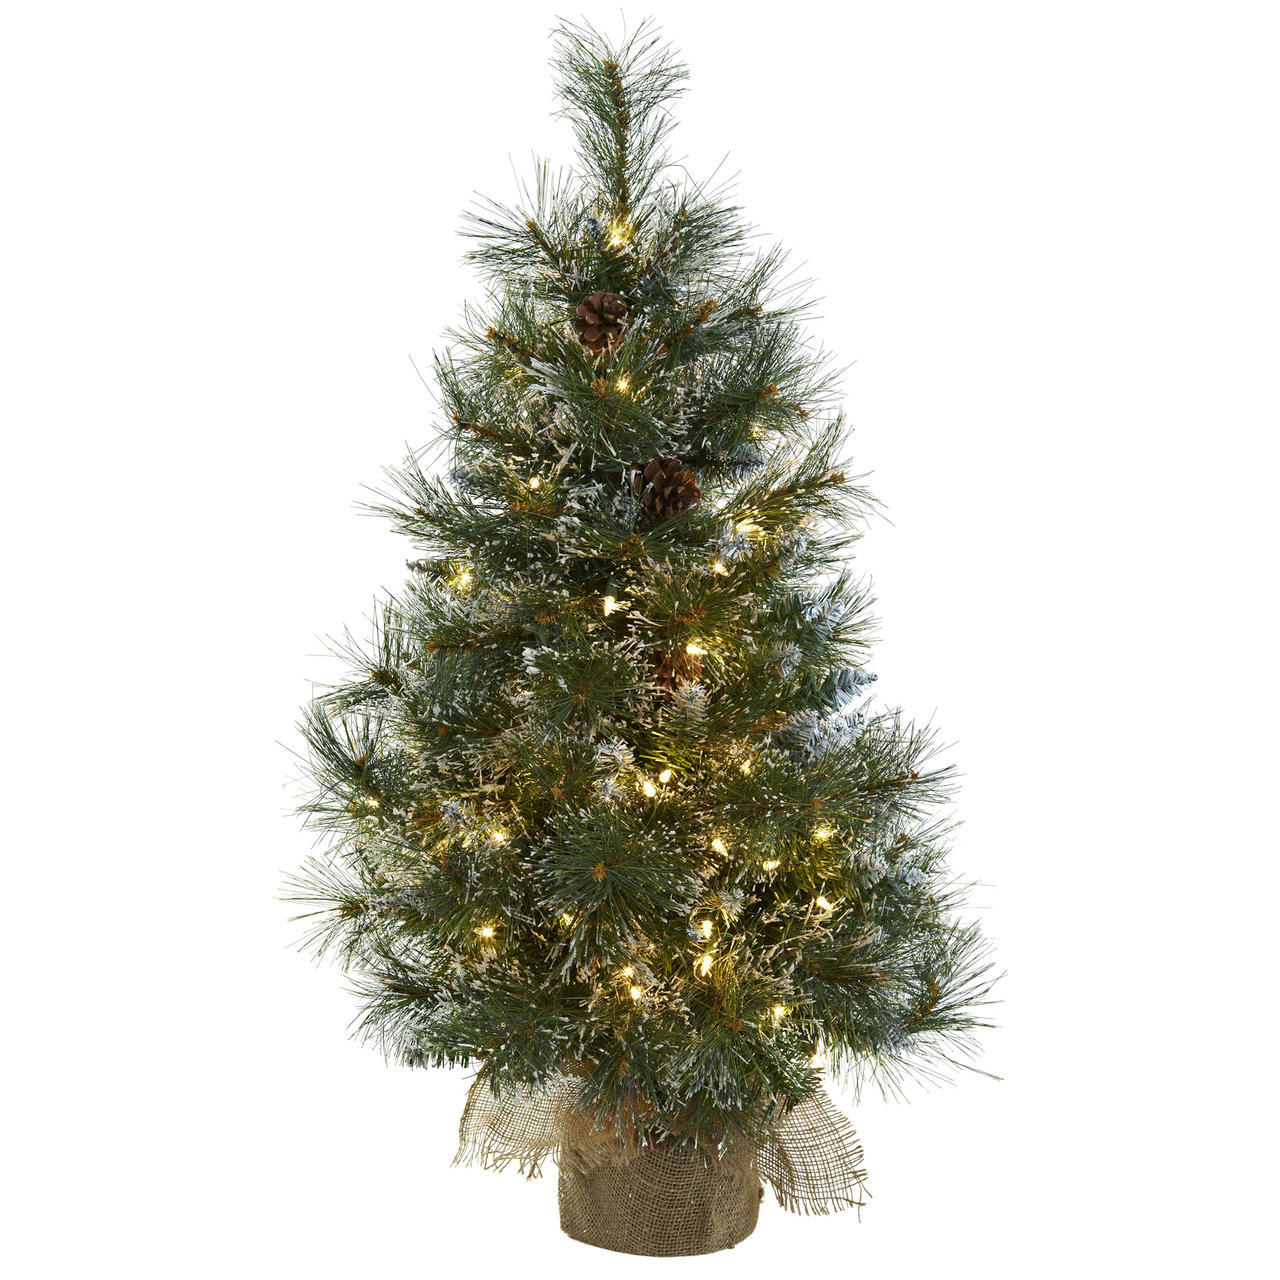 3 Ft Farmhouse Christmas Tree W 100 Clear Lights Flocked Tips Pine Cones Burlap Planter Modern Farmhouse Glam